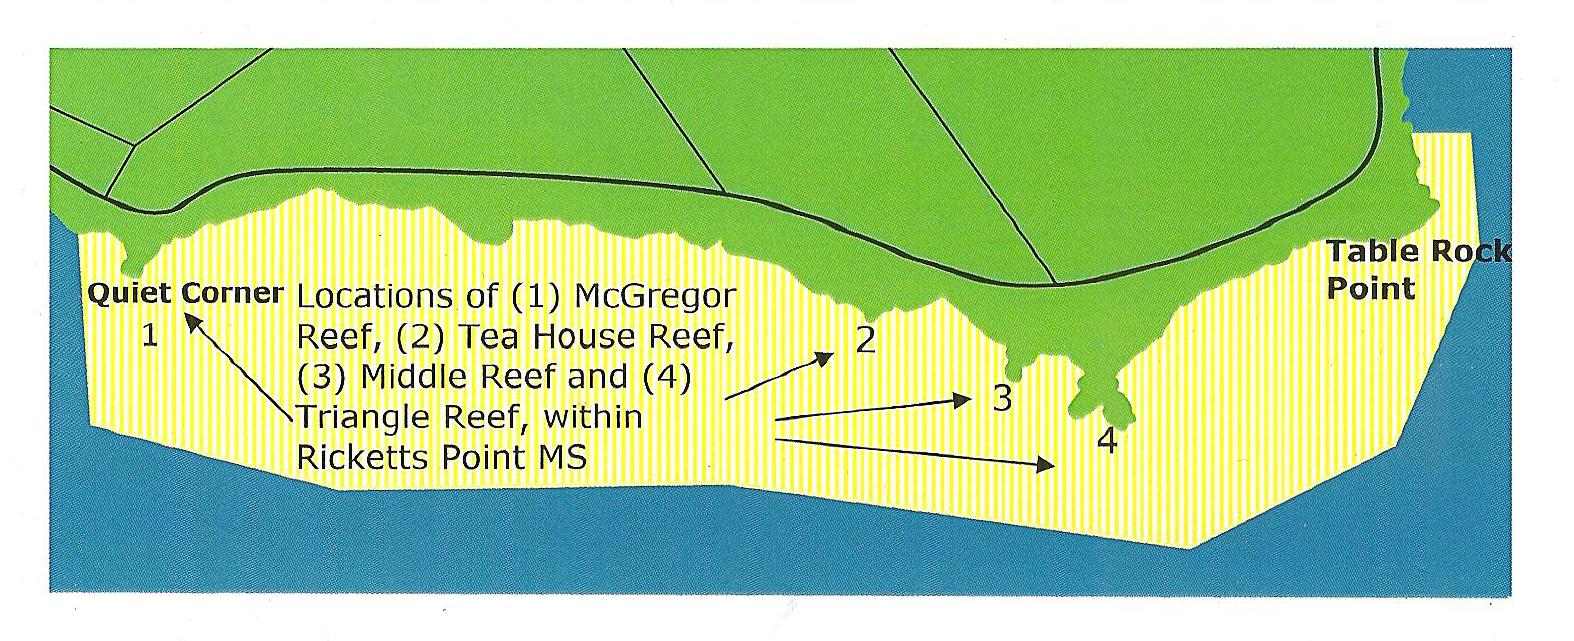 Ricketts Point Locations